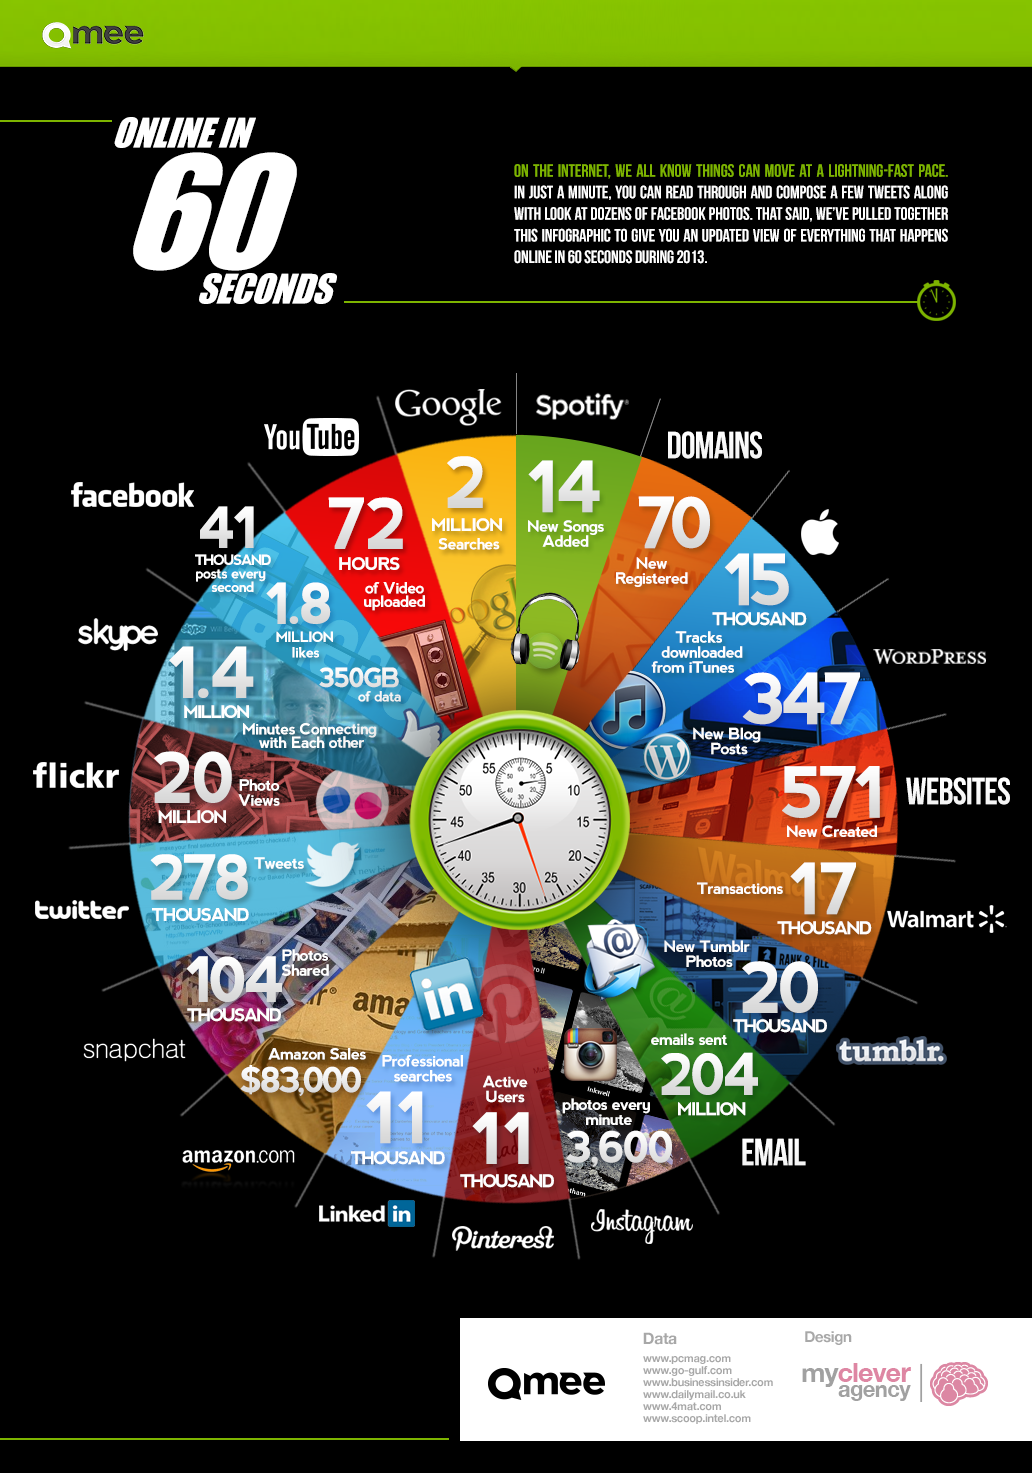 60 segundos en Internet dan para…